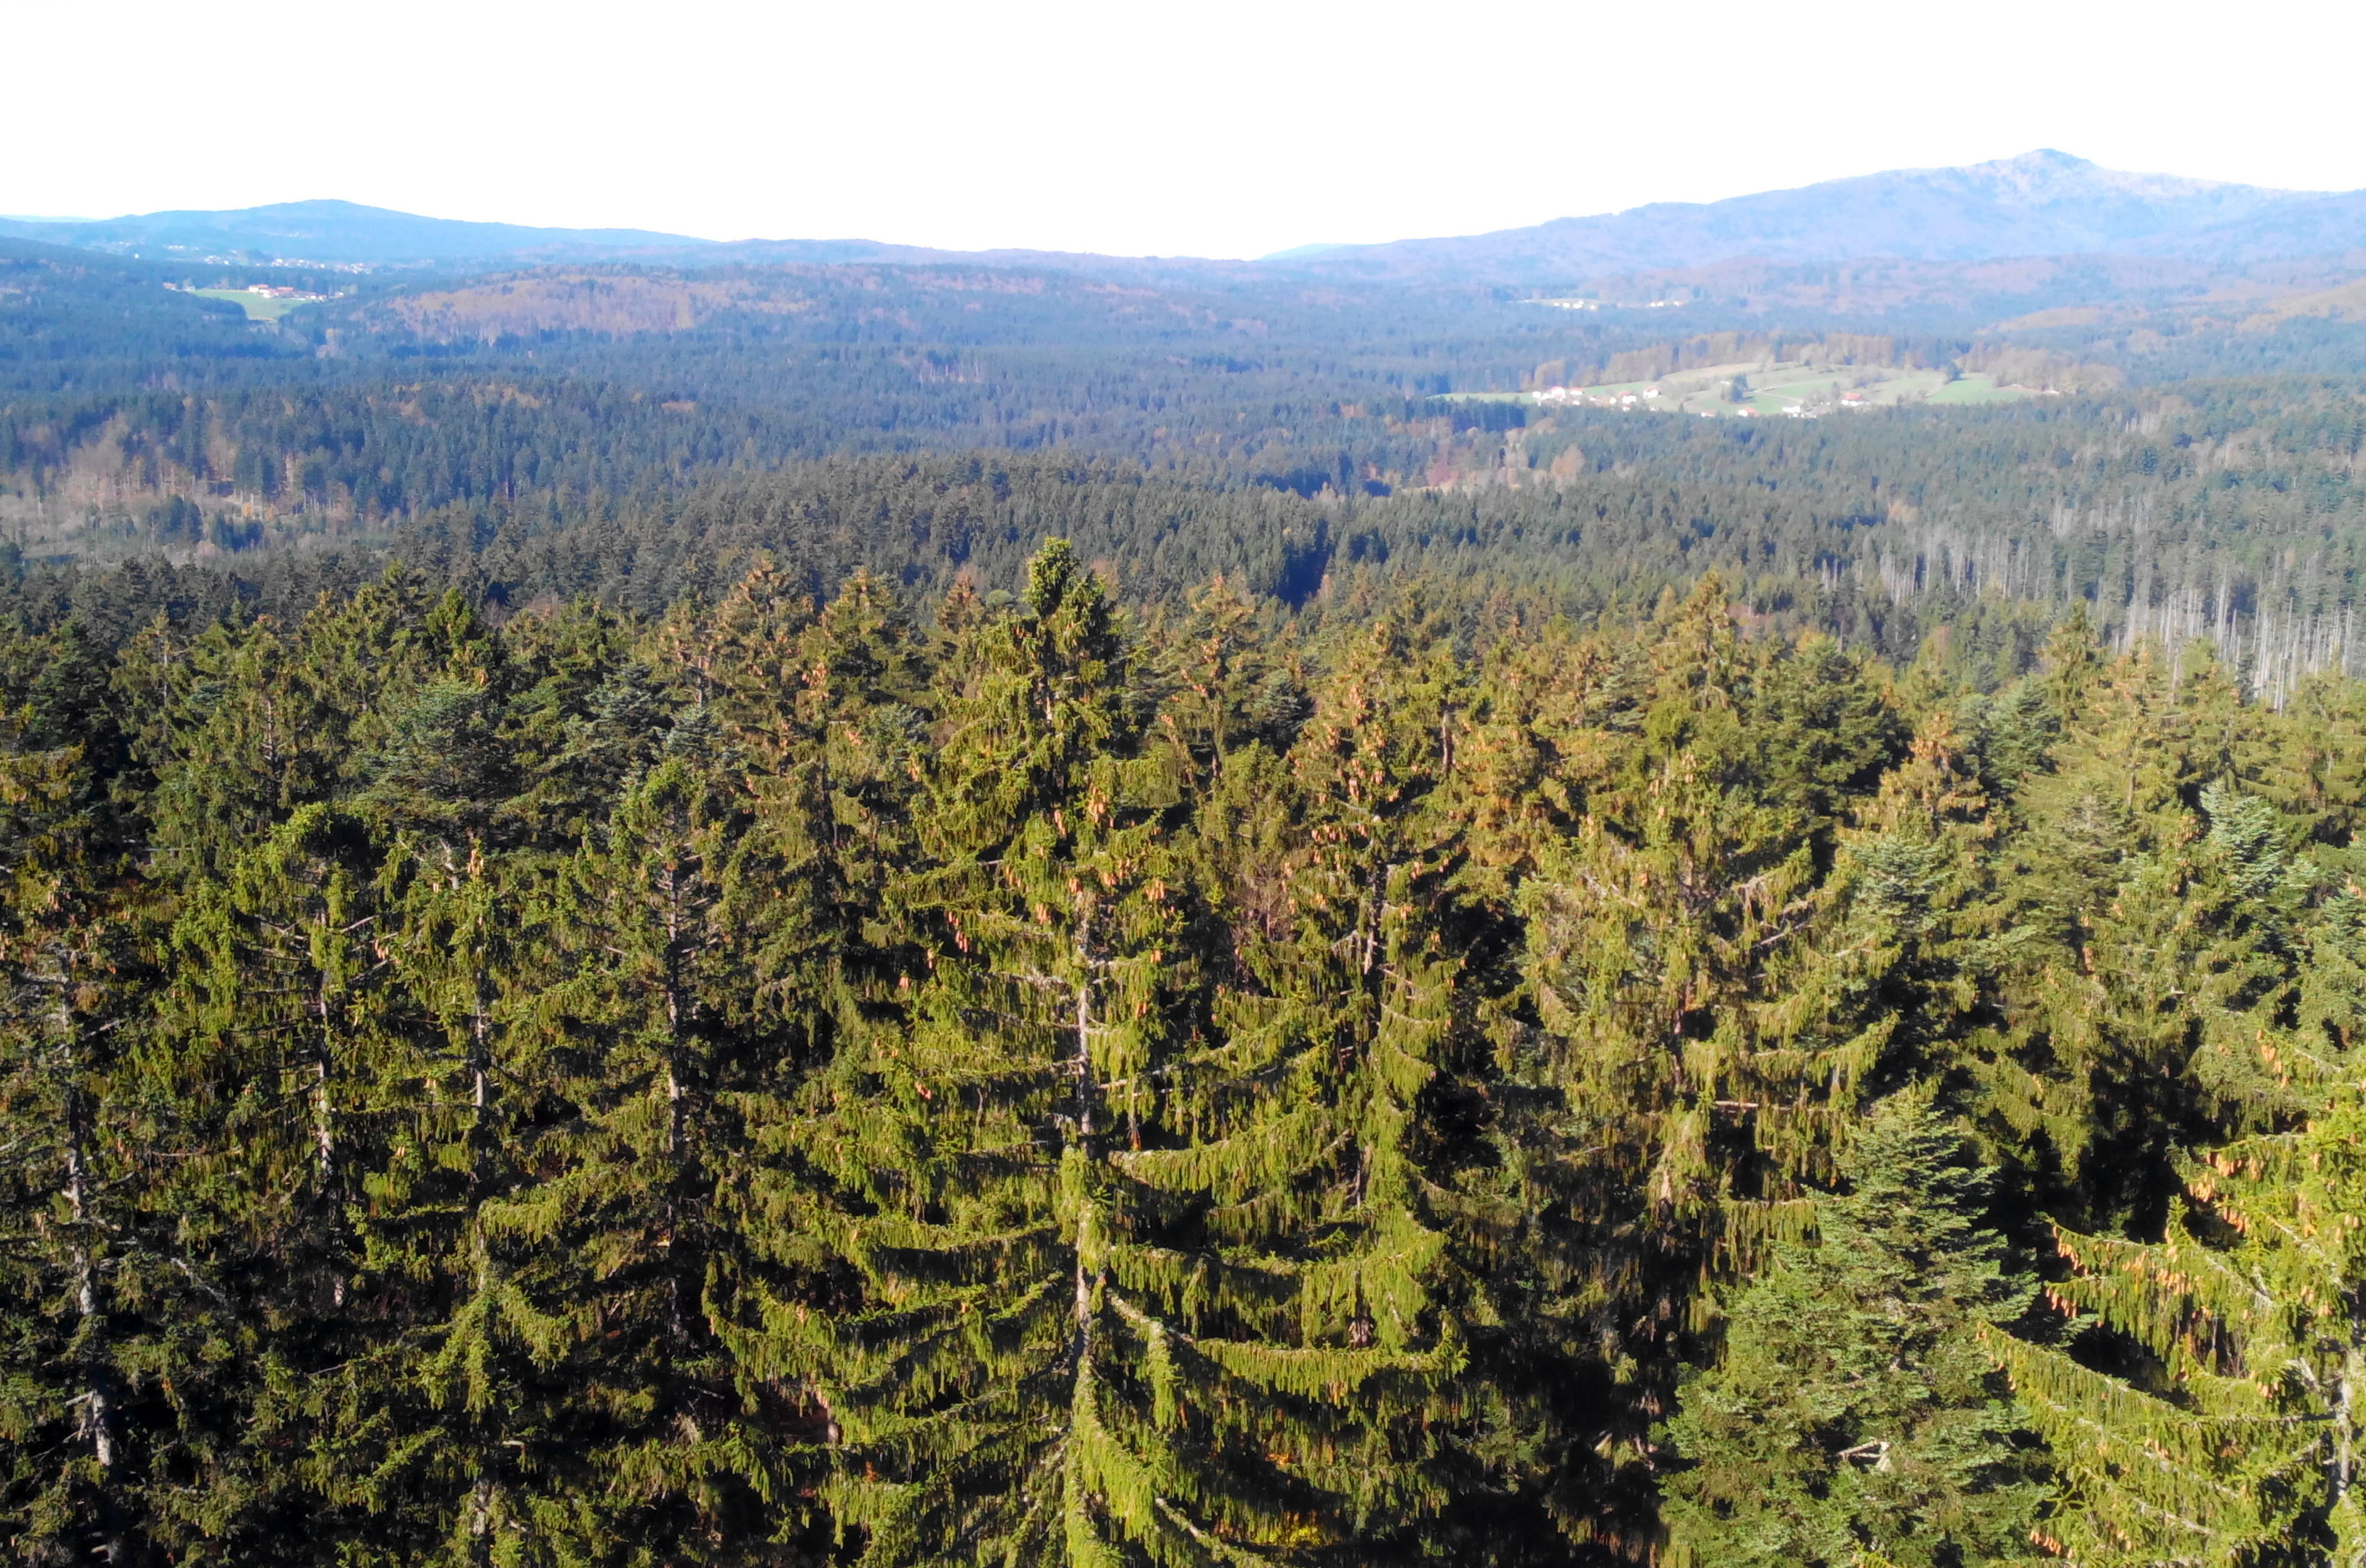 Baumwipfelpfad forêt bavaroise allemagne